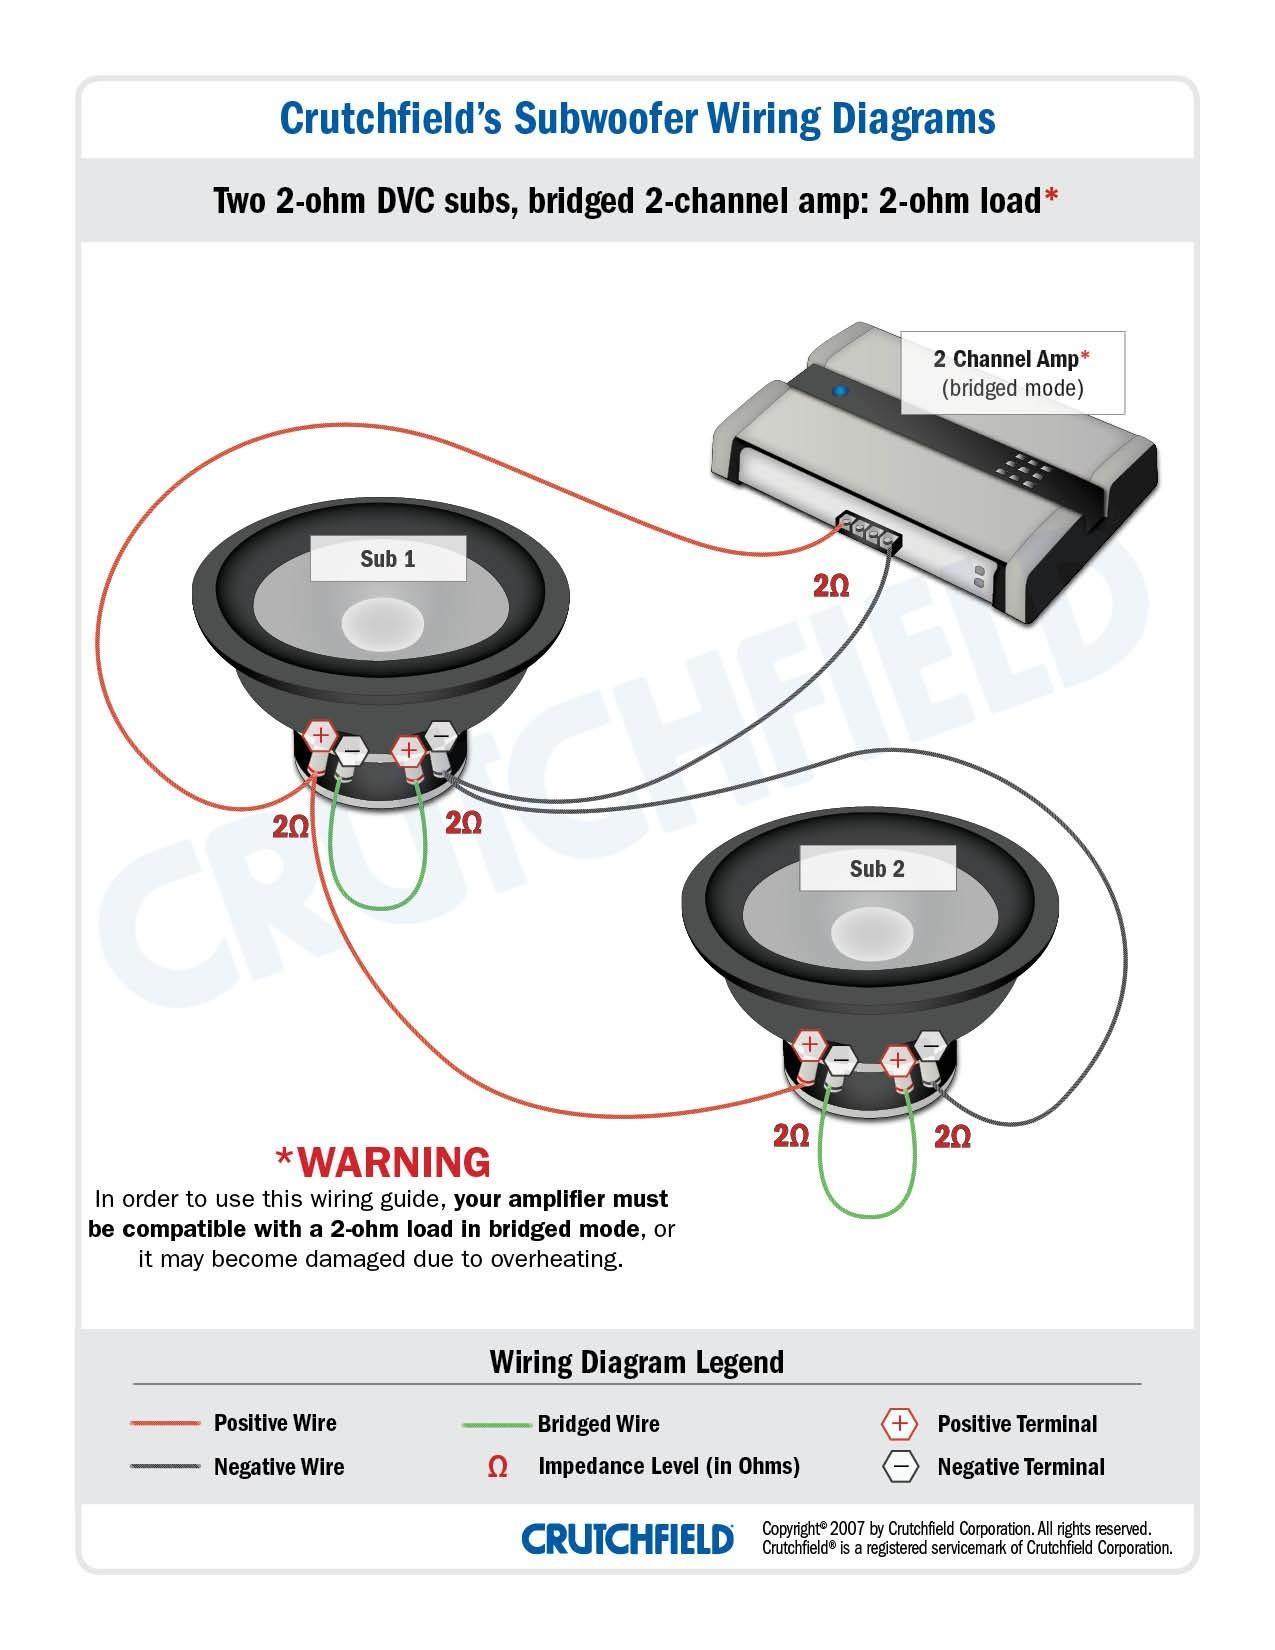 Car Subwoofer Amp Circuit Diagram Car Sub and Amp Wiring Diagram Wiring Diagram – Simplepilgrimage Of Car Subwoofer Amp Circuit Diagram